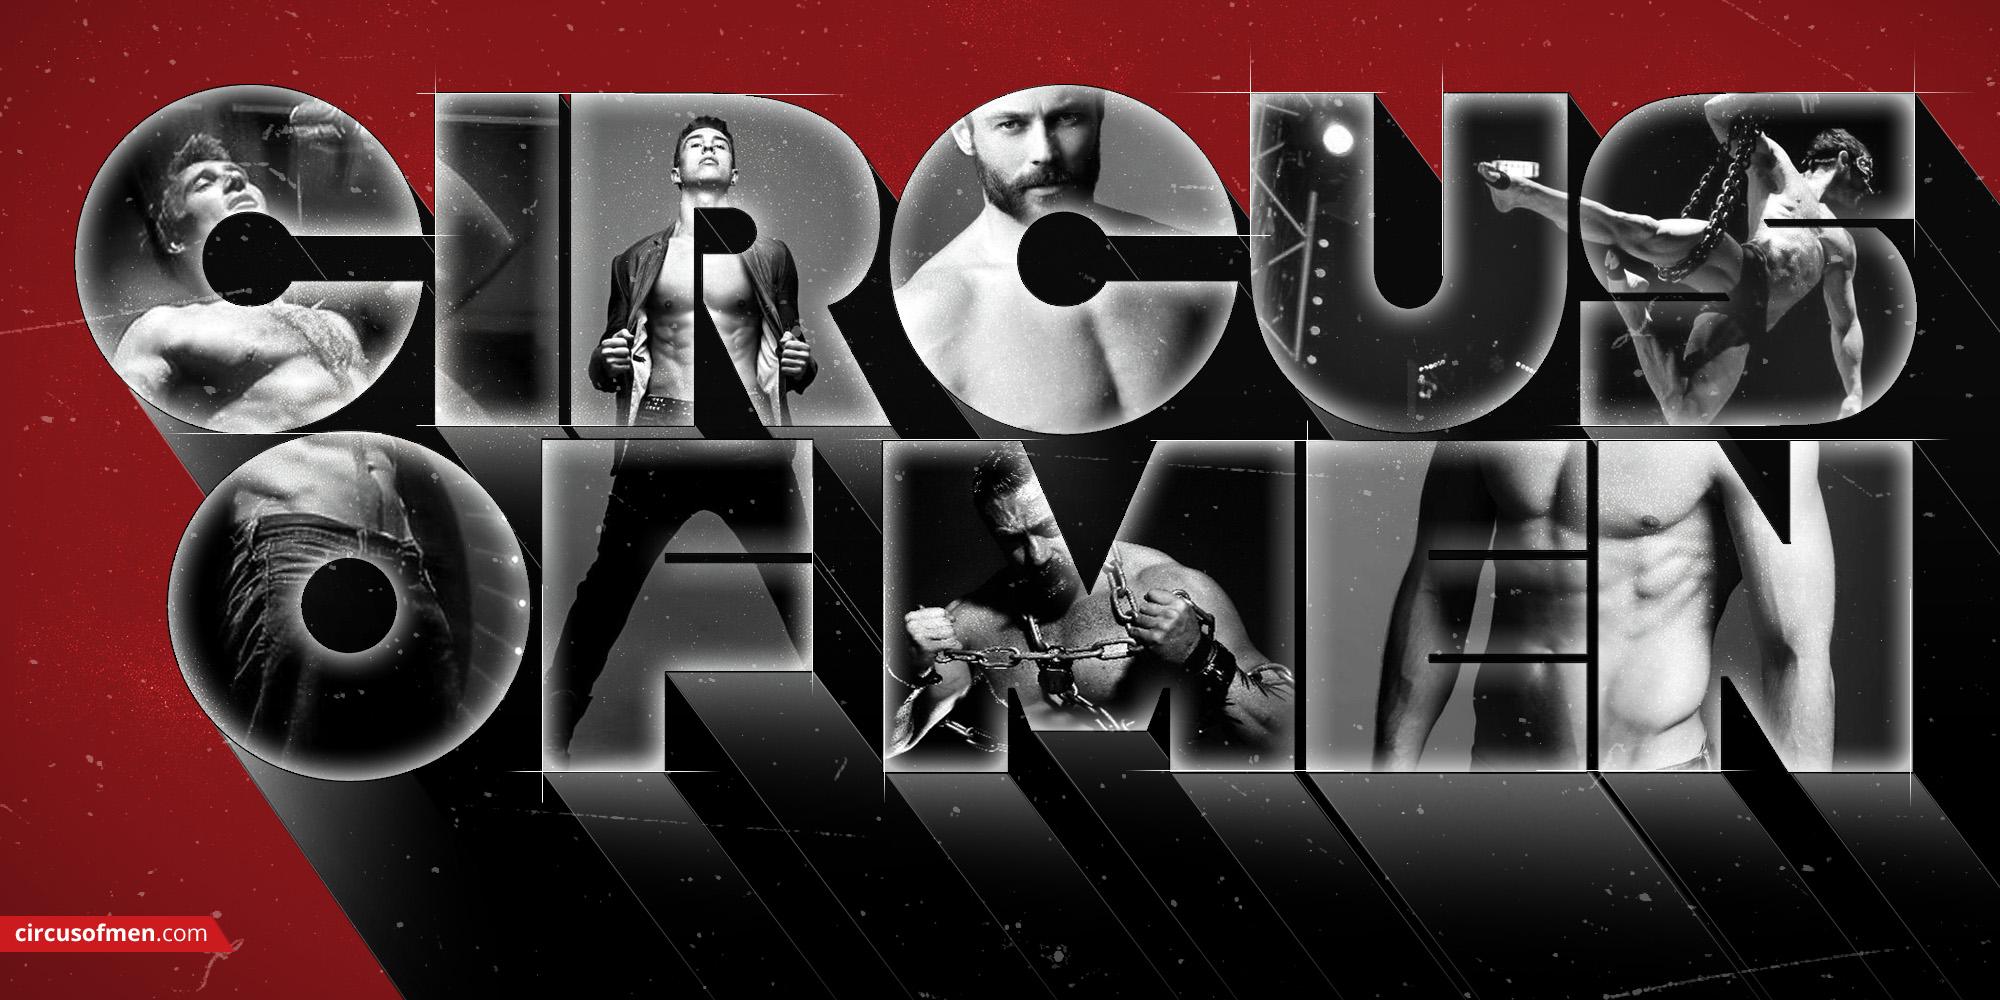 Circus Of Men - Black Fire Agency